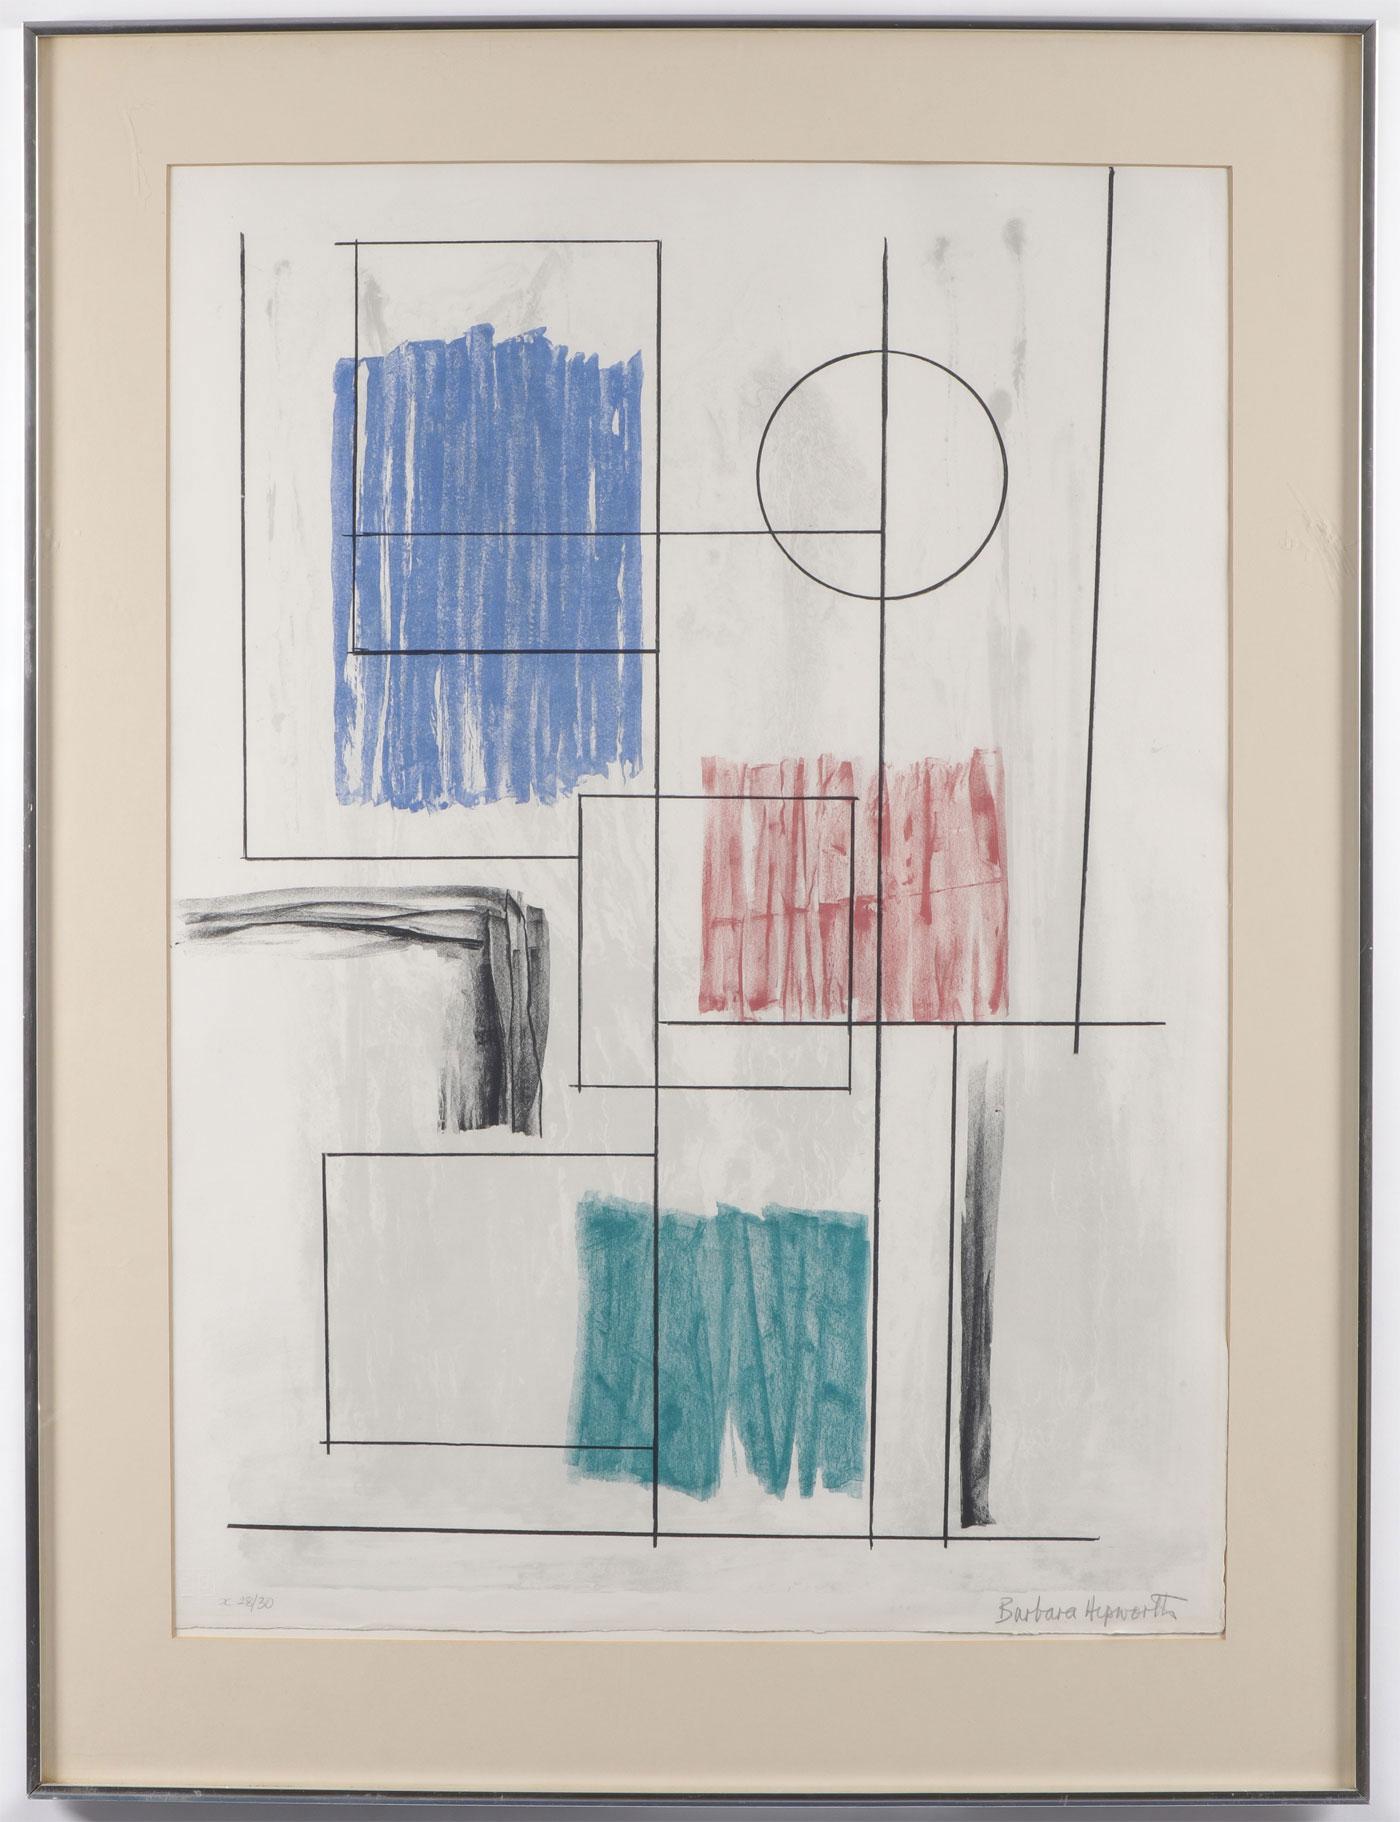 BARBARA HEPWORTH MODERN WORK - Image 3 of 3